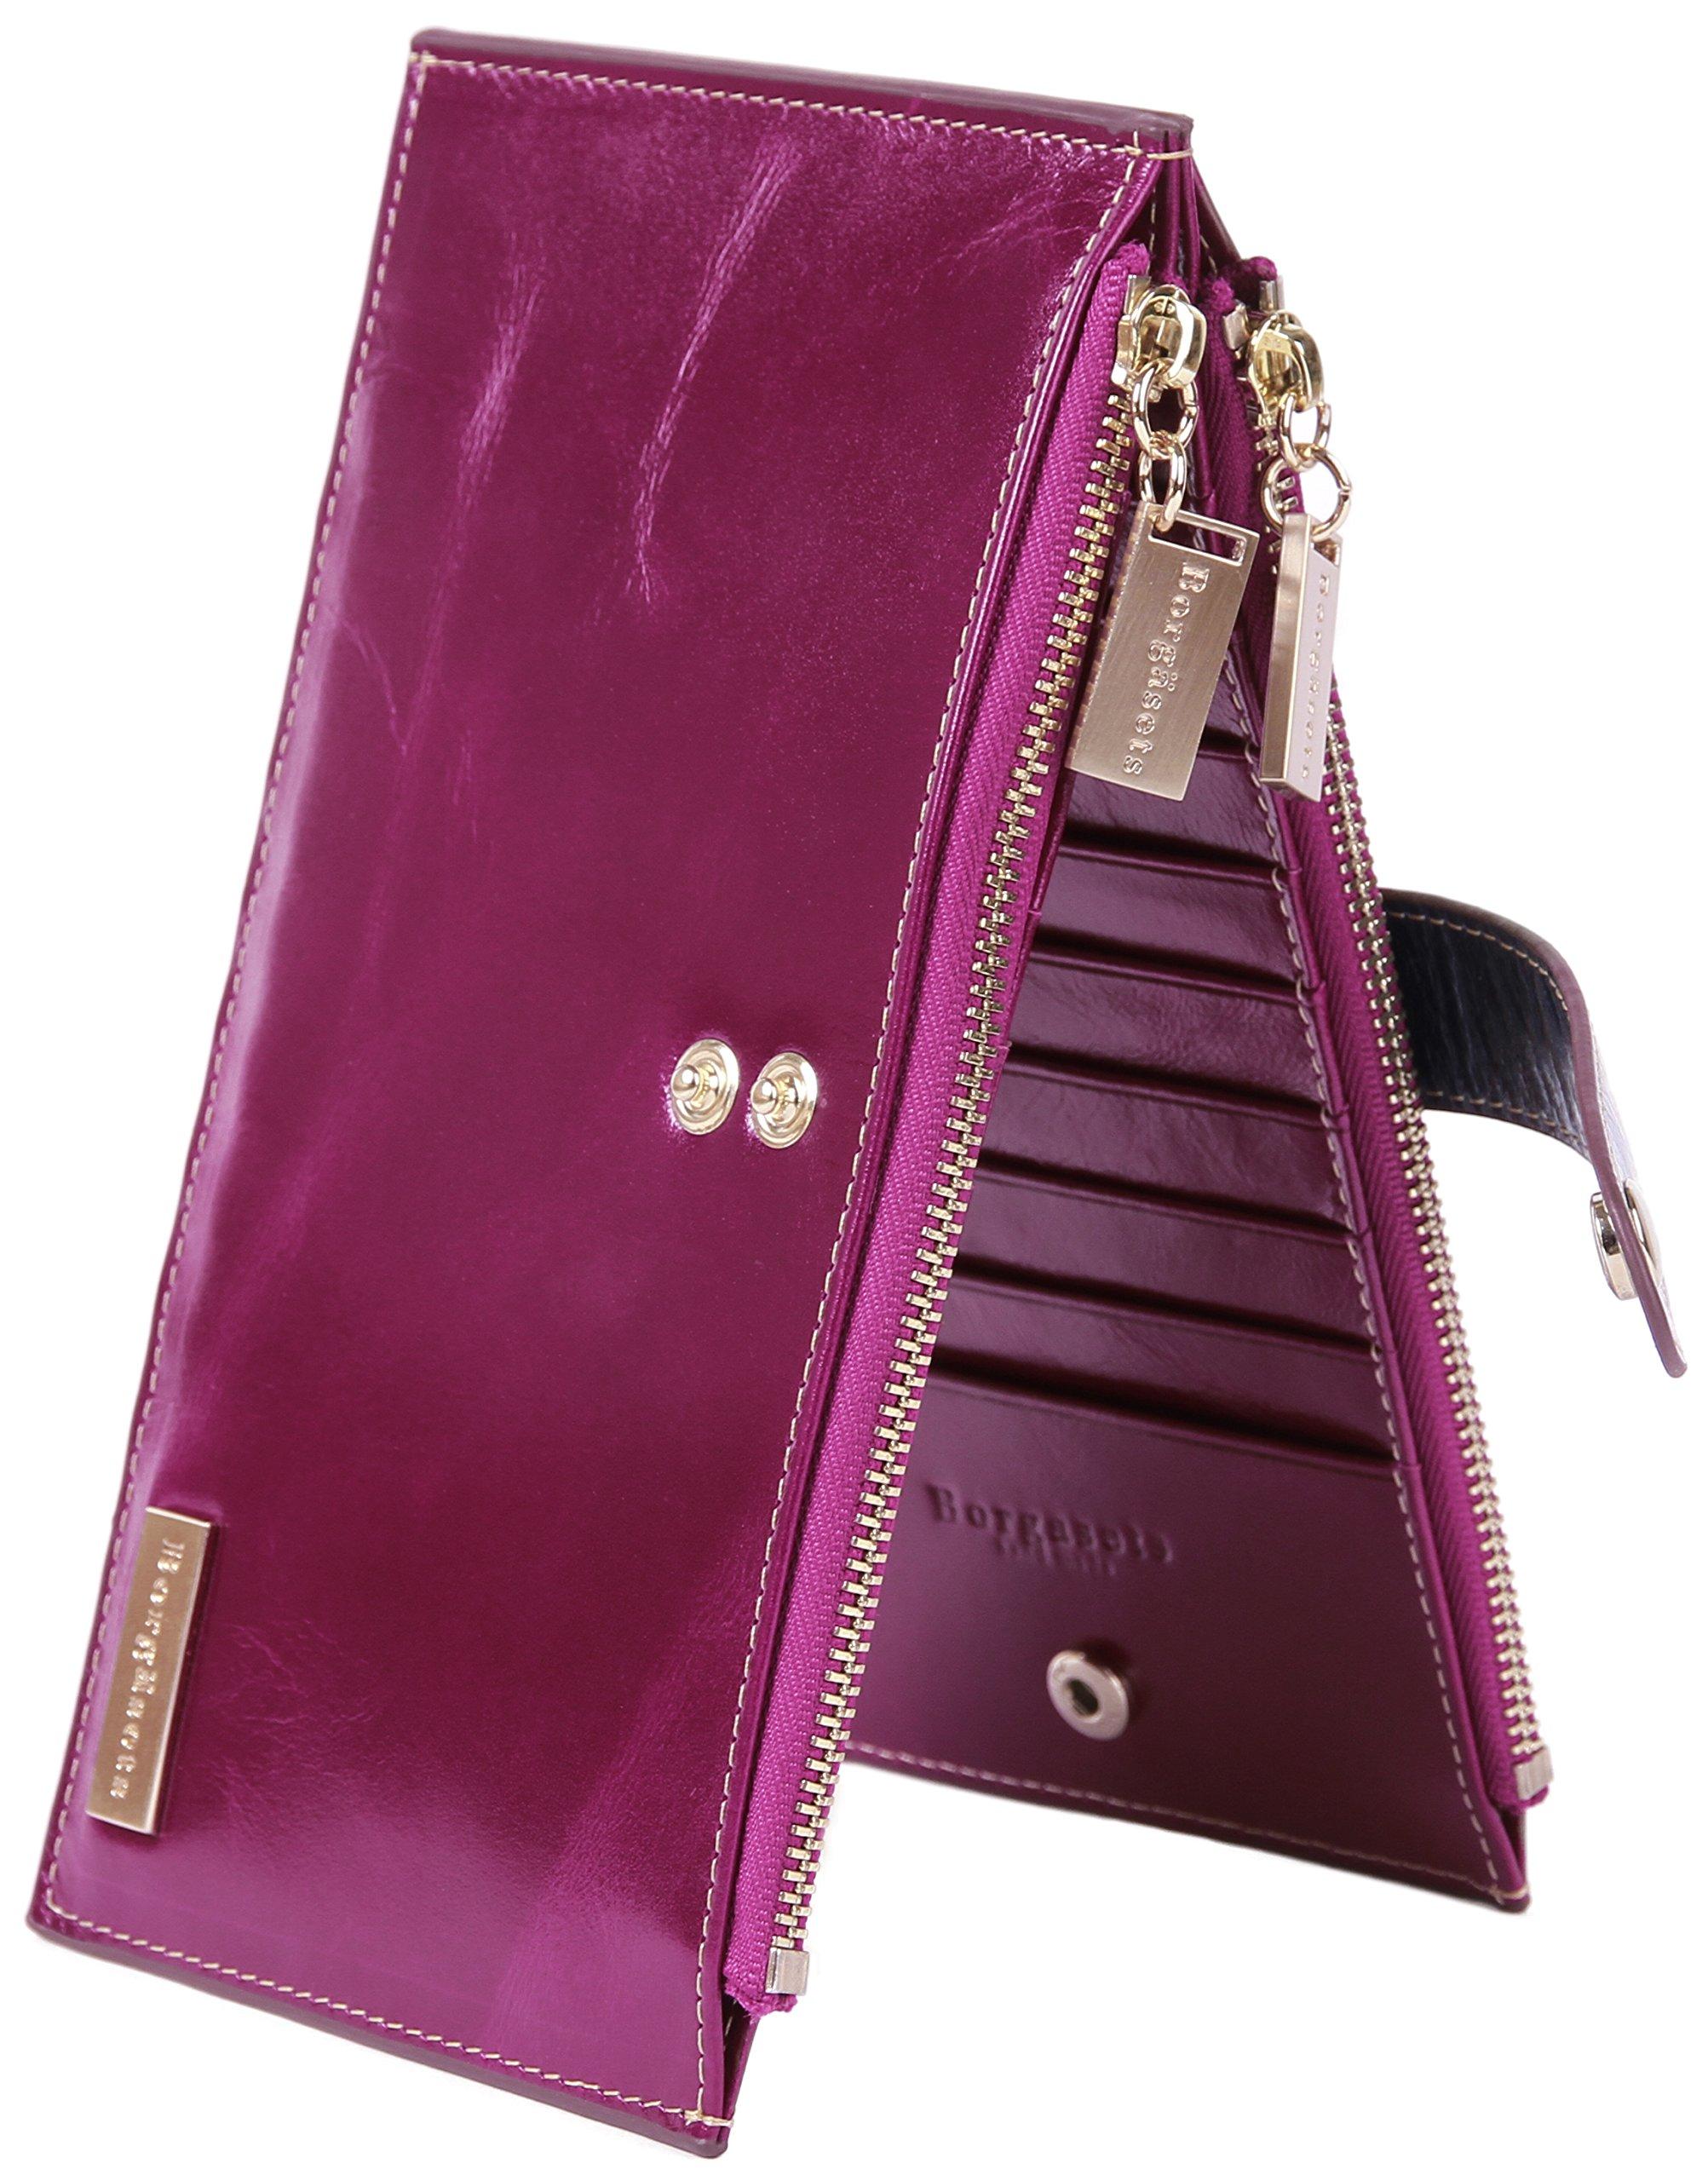 Borgasets RFID Blocking Women's Genuine Leather Wallet Credit Card Holder Zipper Purse Purple